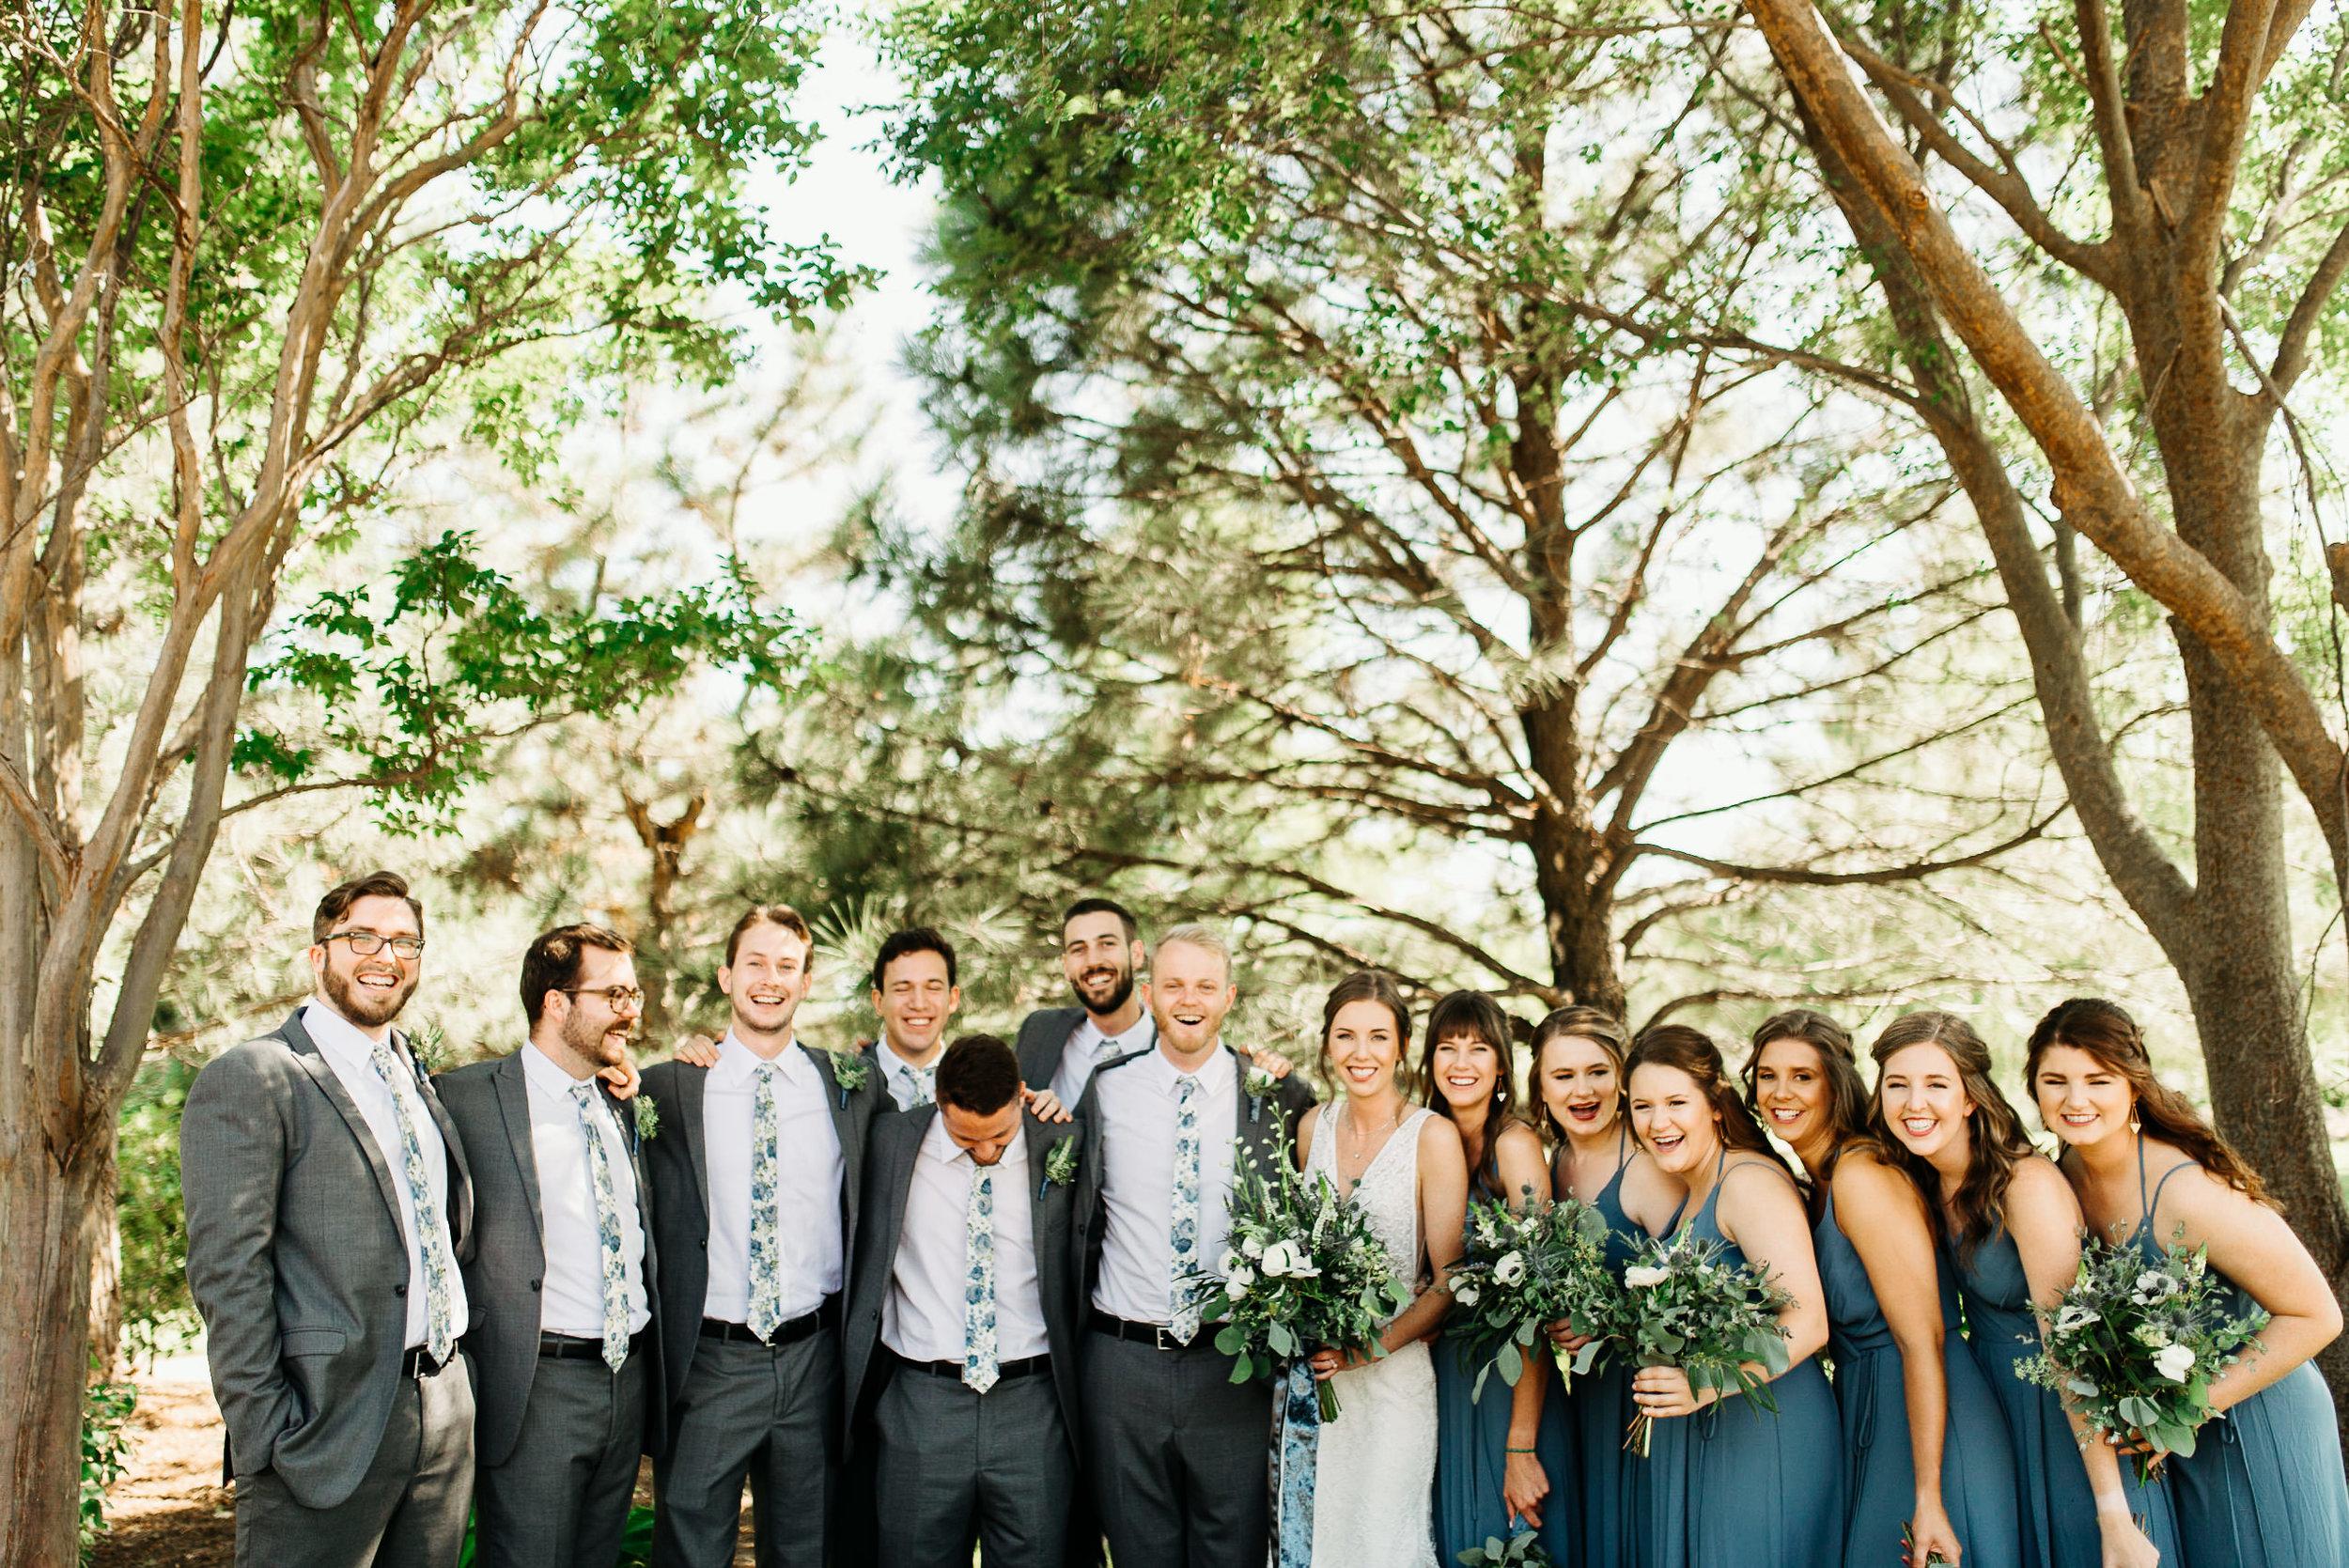 okc-wedding-photographer-coles-garden-wedding-okc-best-wedding-photographers-50.jpg